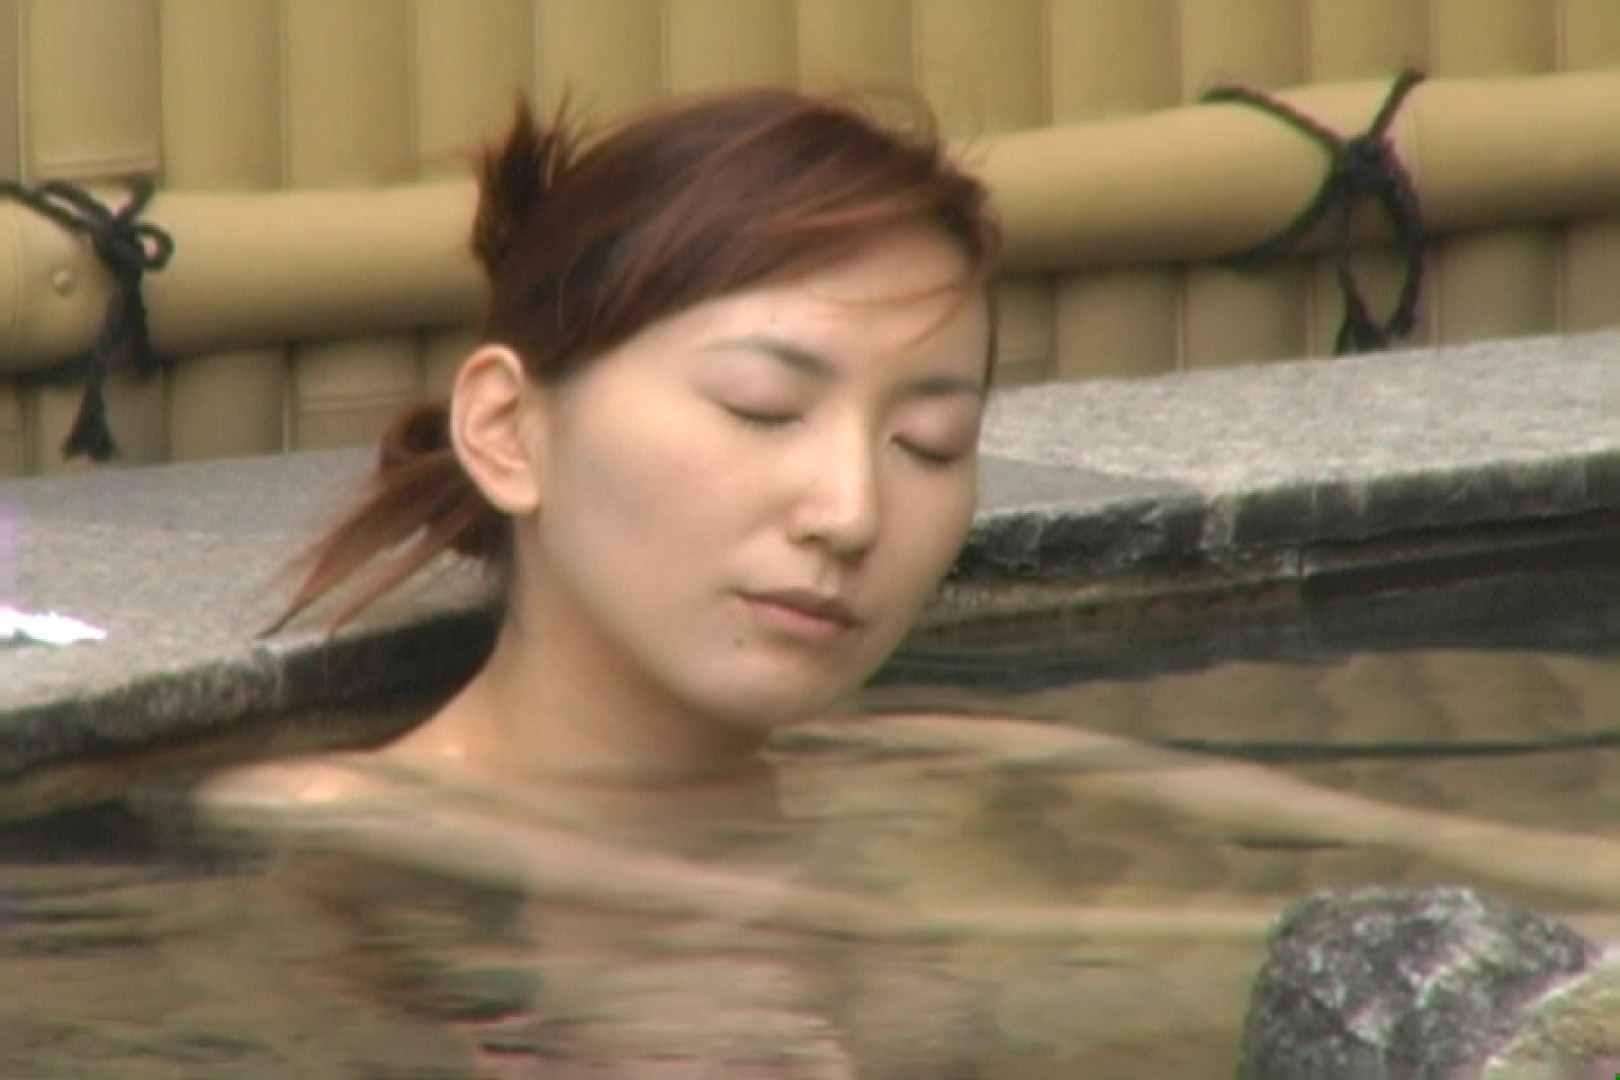 Aquaな露天風呂Vol.616 露天風呂編   盗撮シリーズ  89PIX 35